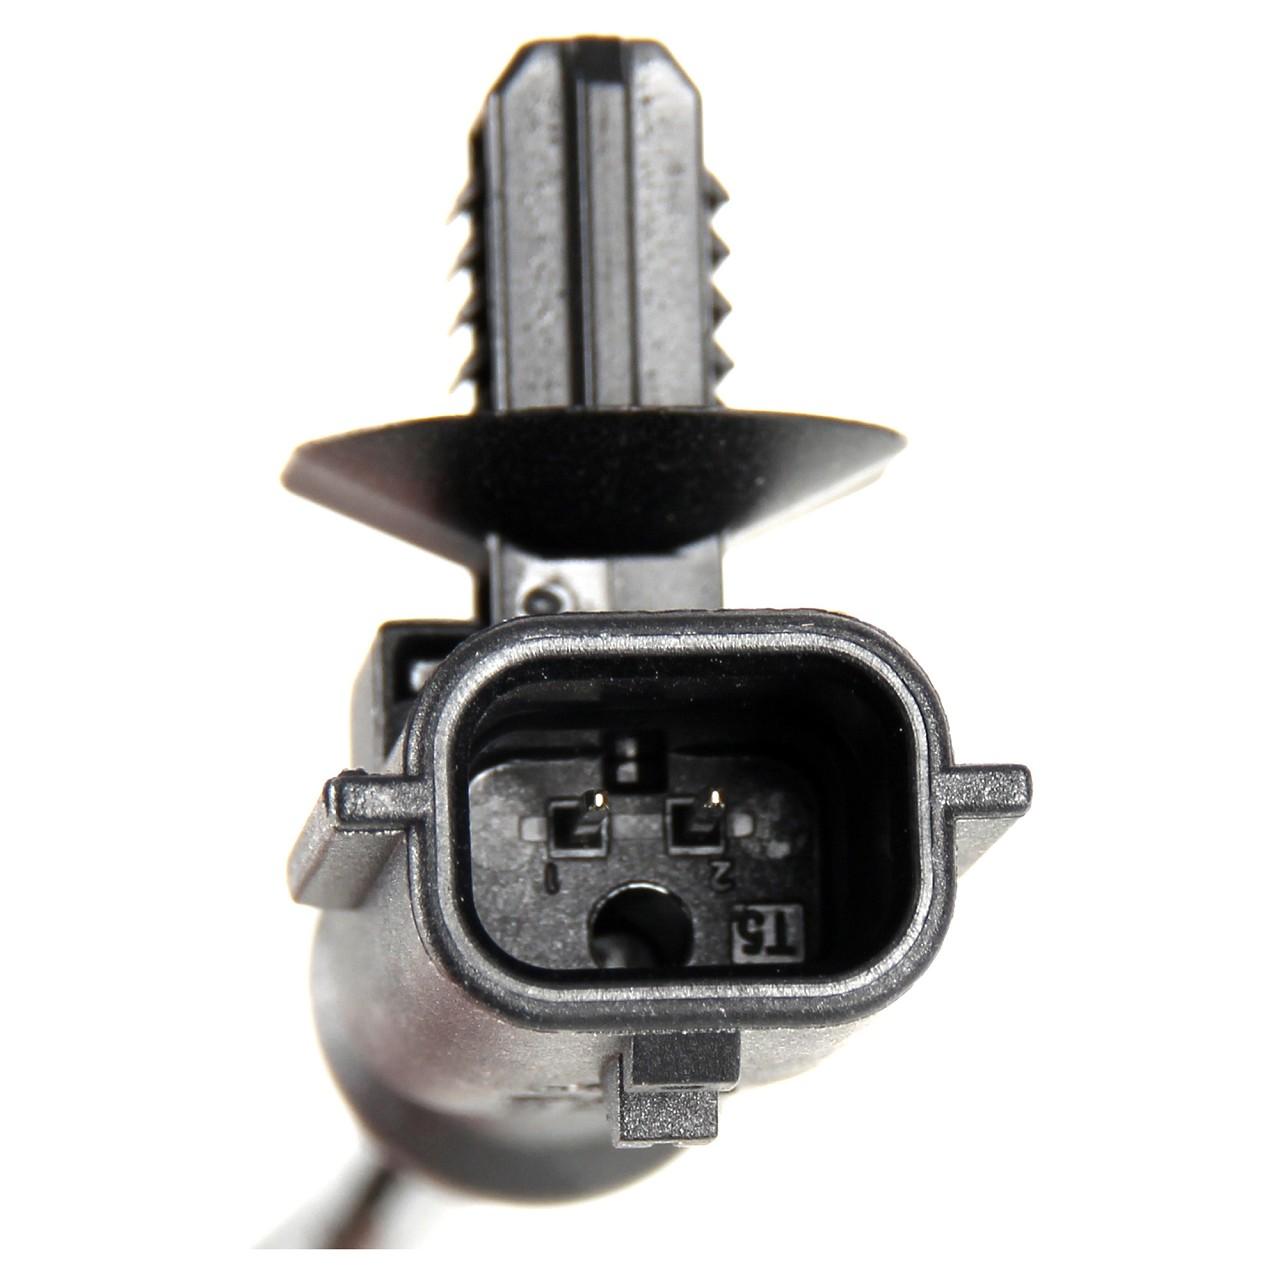 ORIGINAL Ford ABS Sensor Raddrehzahlsensor FIESTA VI MK6 hinten 2094988